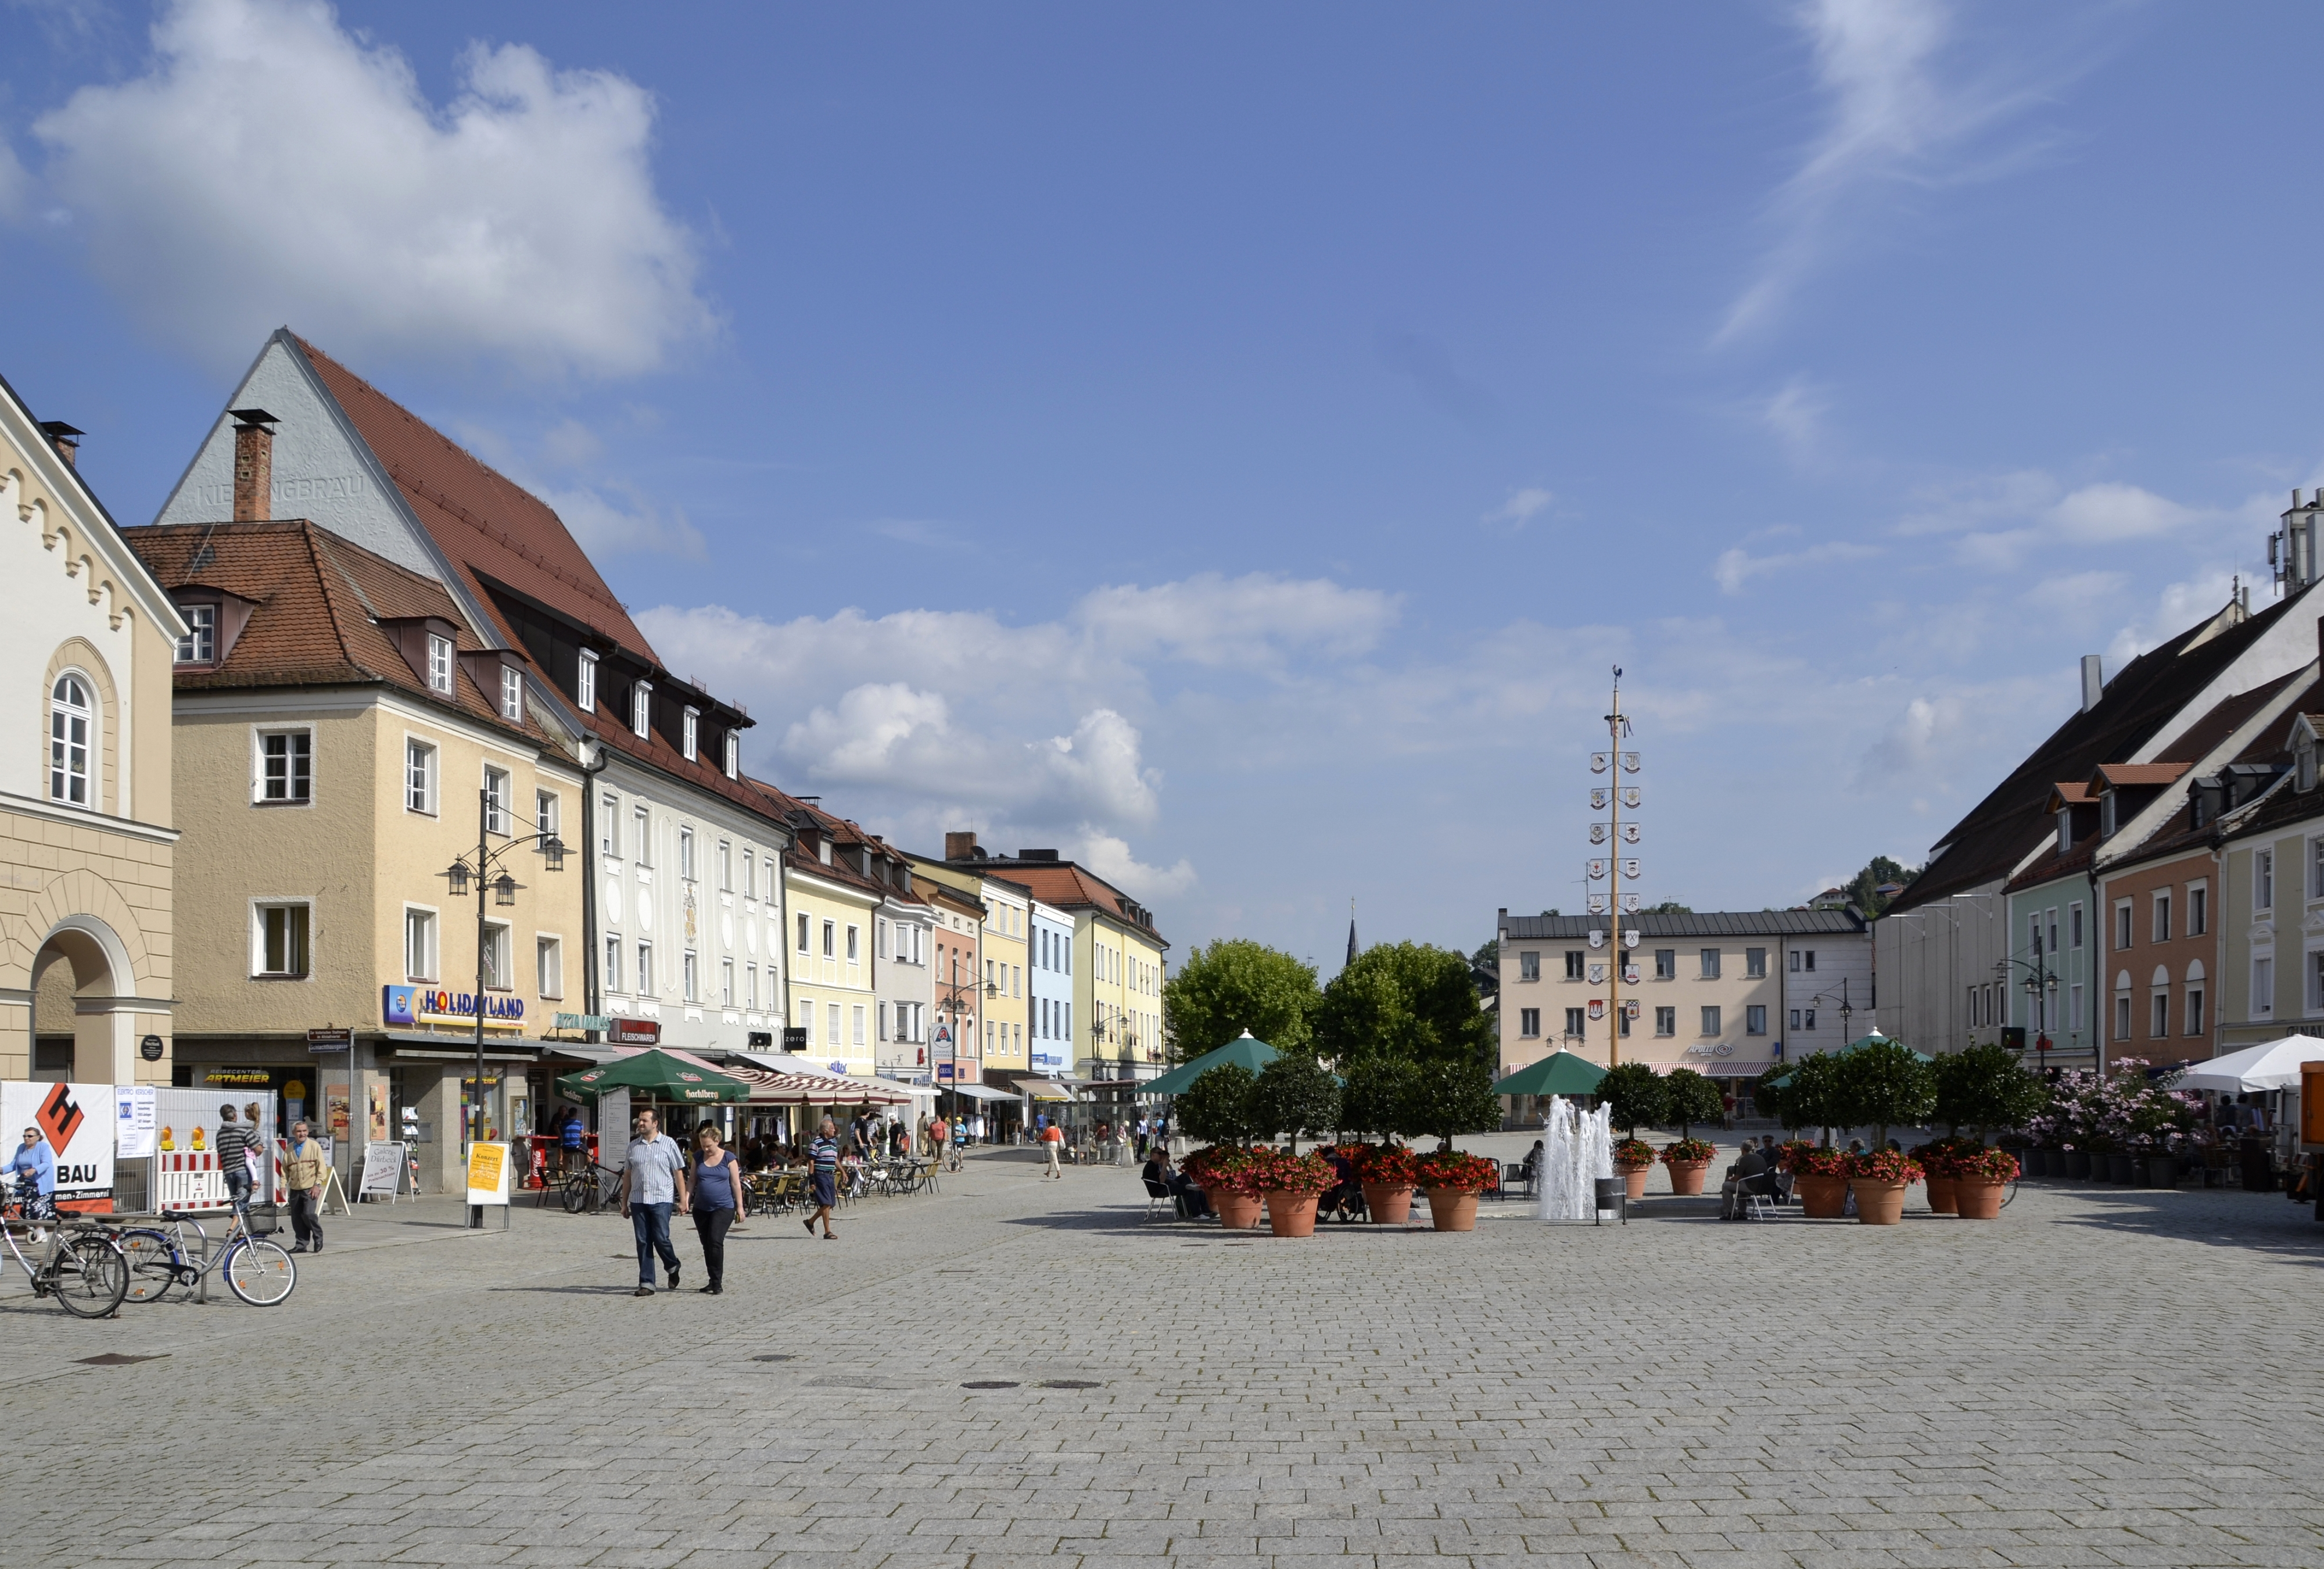 File:Stadtplatz von Deggendorf -03.JPG - Wikimedia Commons